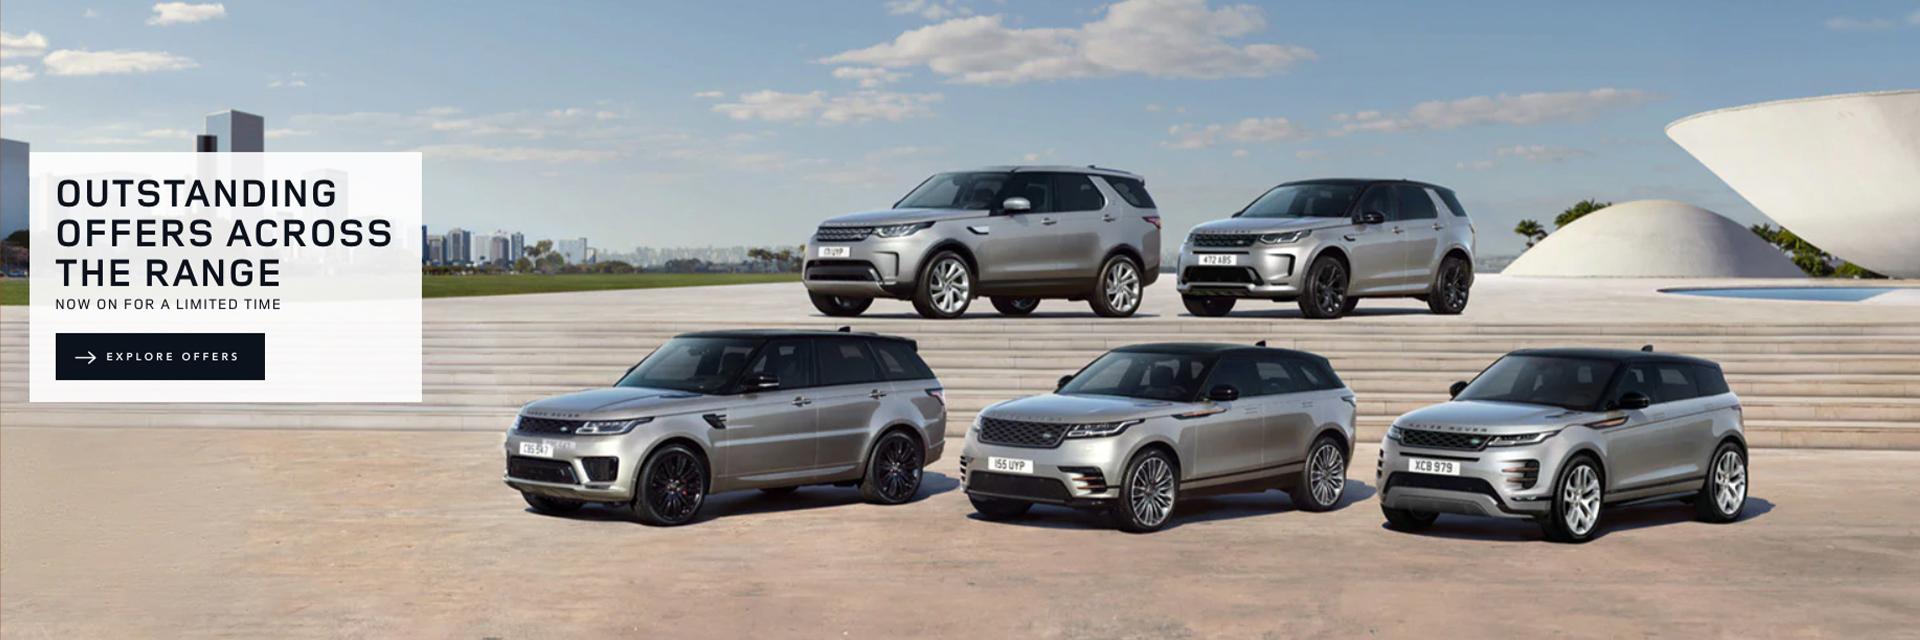 Land Rover September Offers